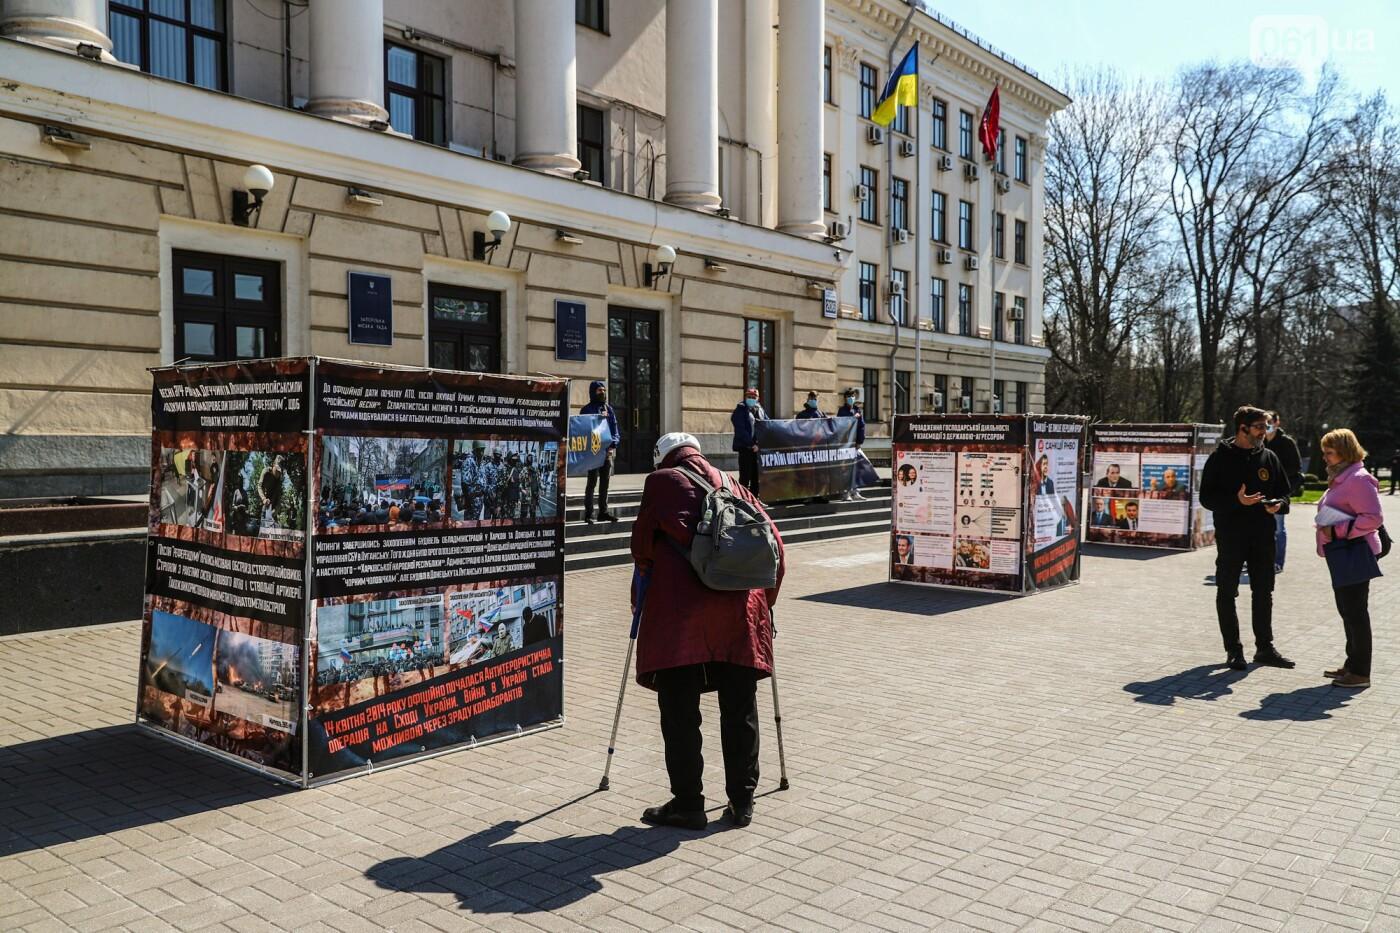 В Запорожье возле мэрии установили стенды с портретами Медведчука и Шария, - ФОТО, фото-12